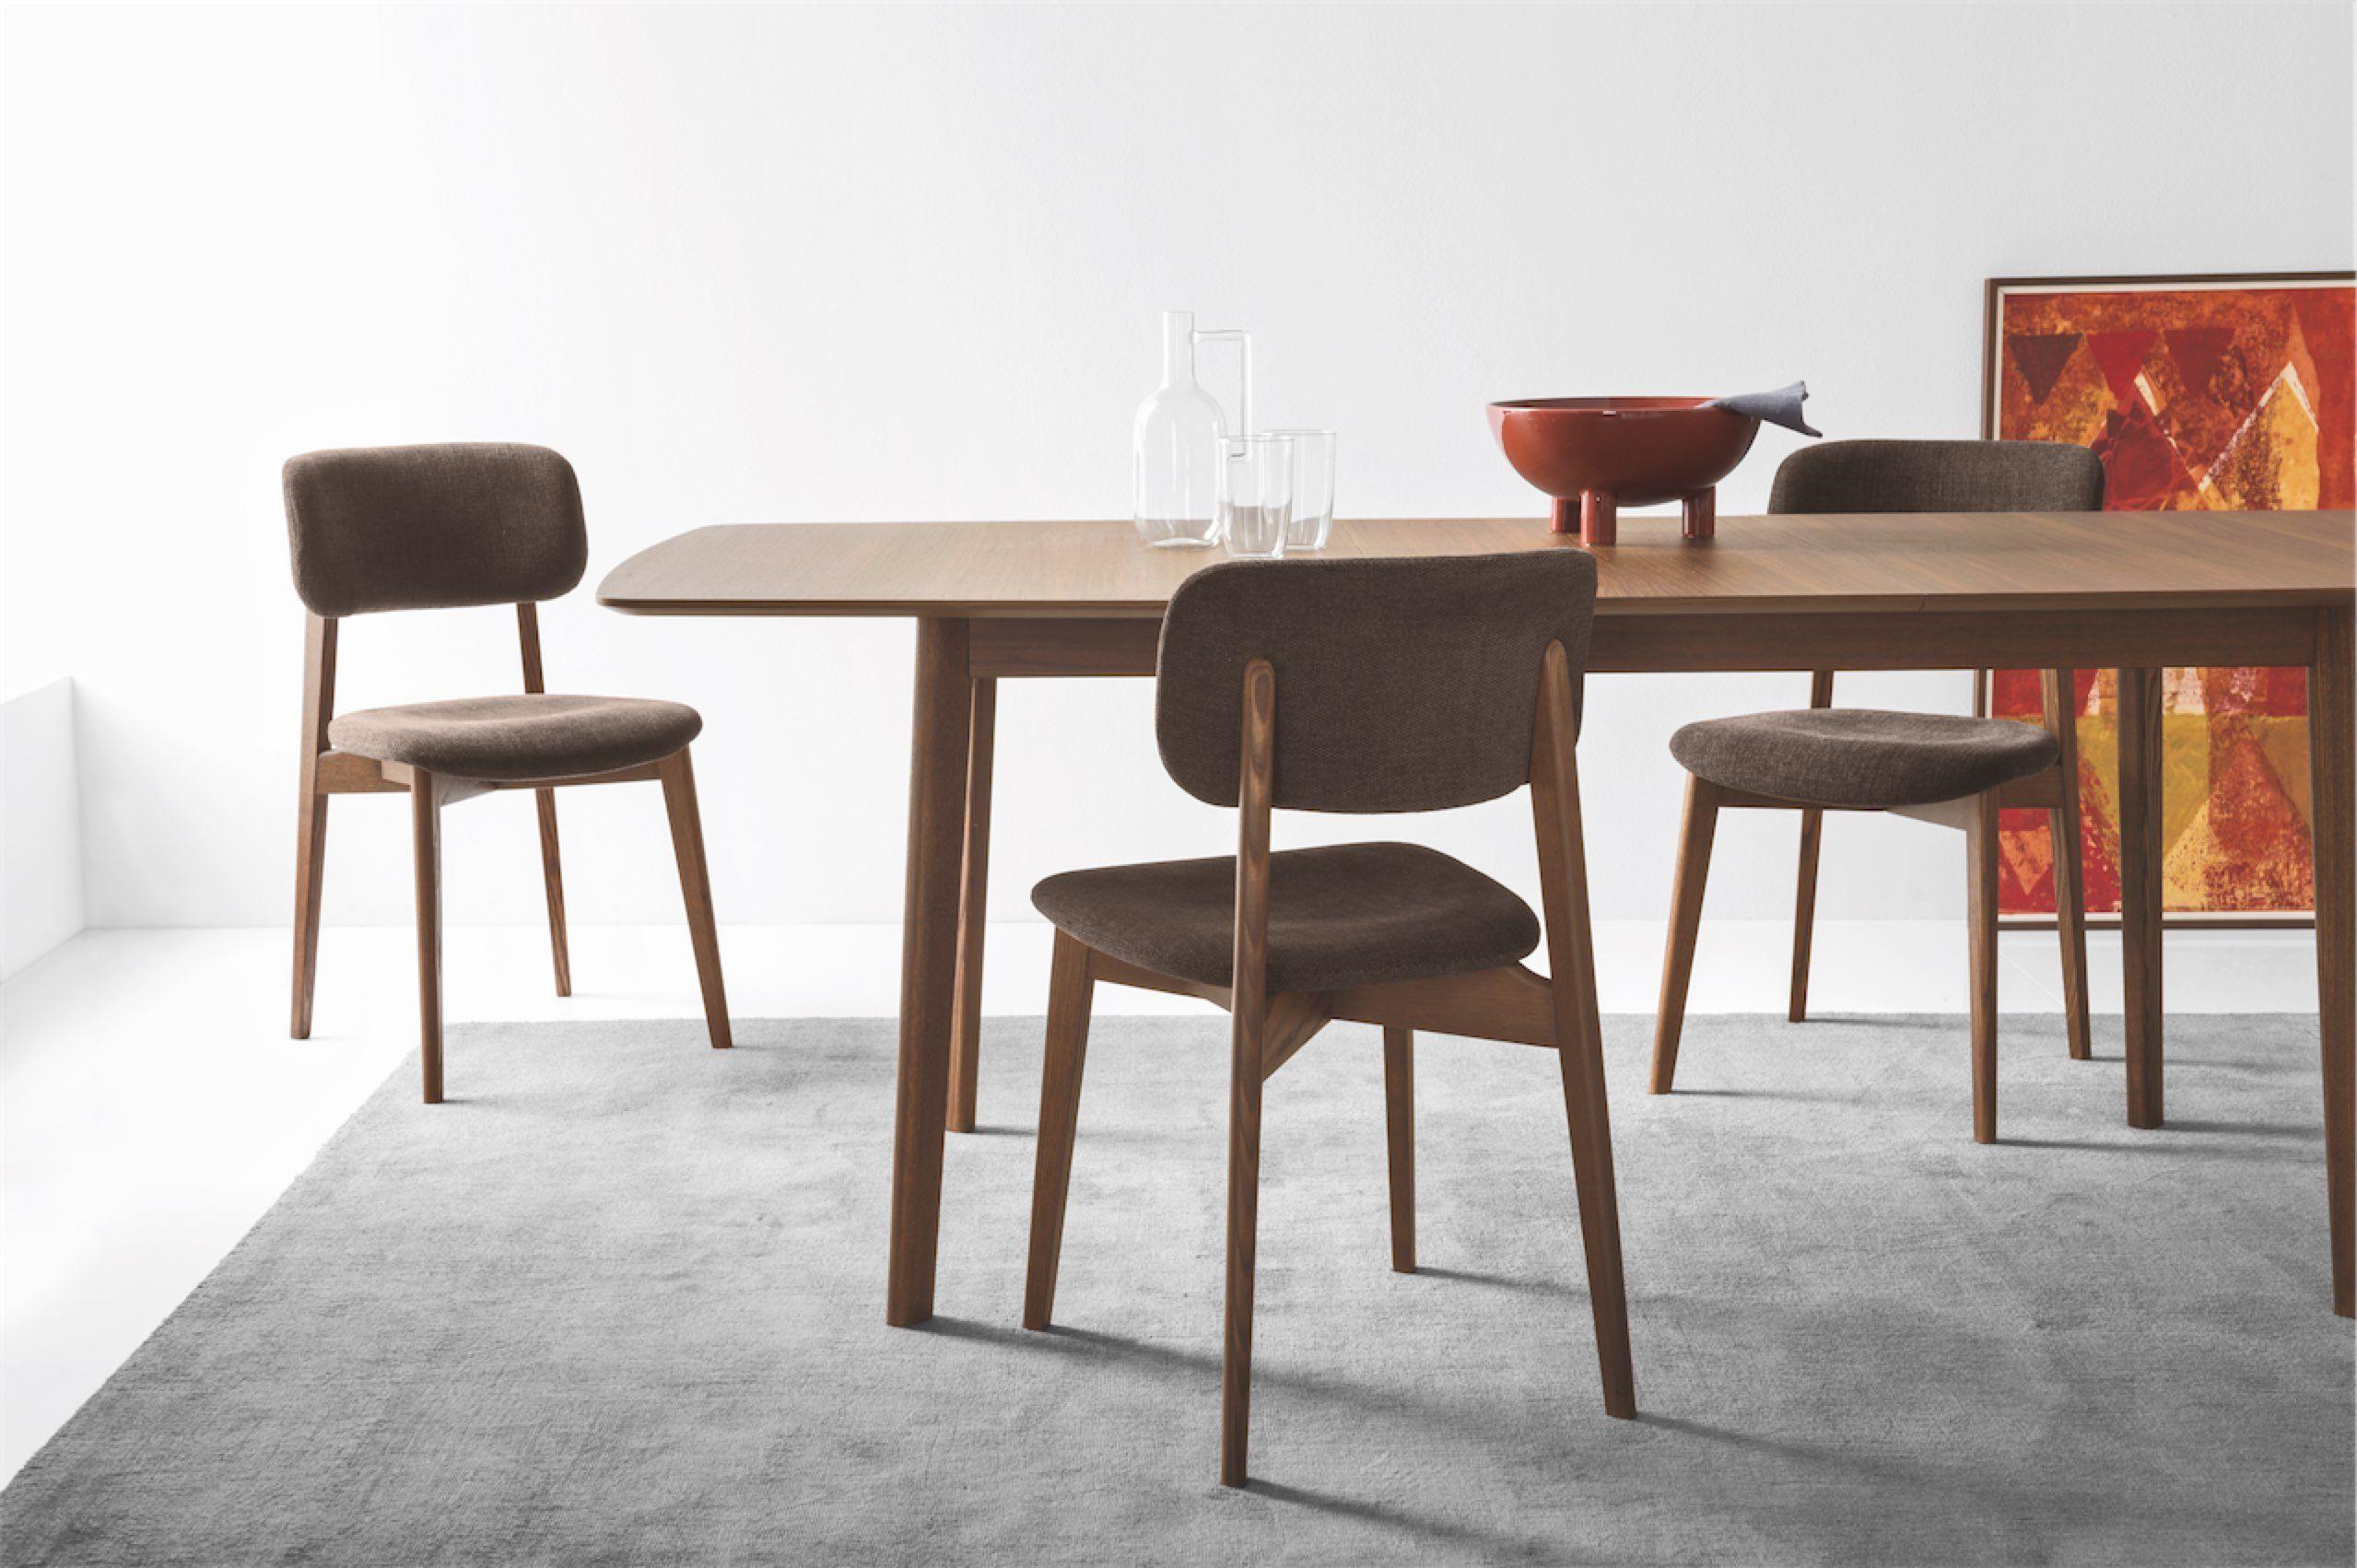 Chaises Skin de Calligaris 100 € | {Design} Sofas & Chairs | Pinterest